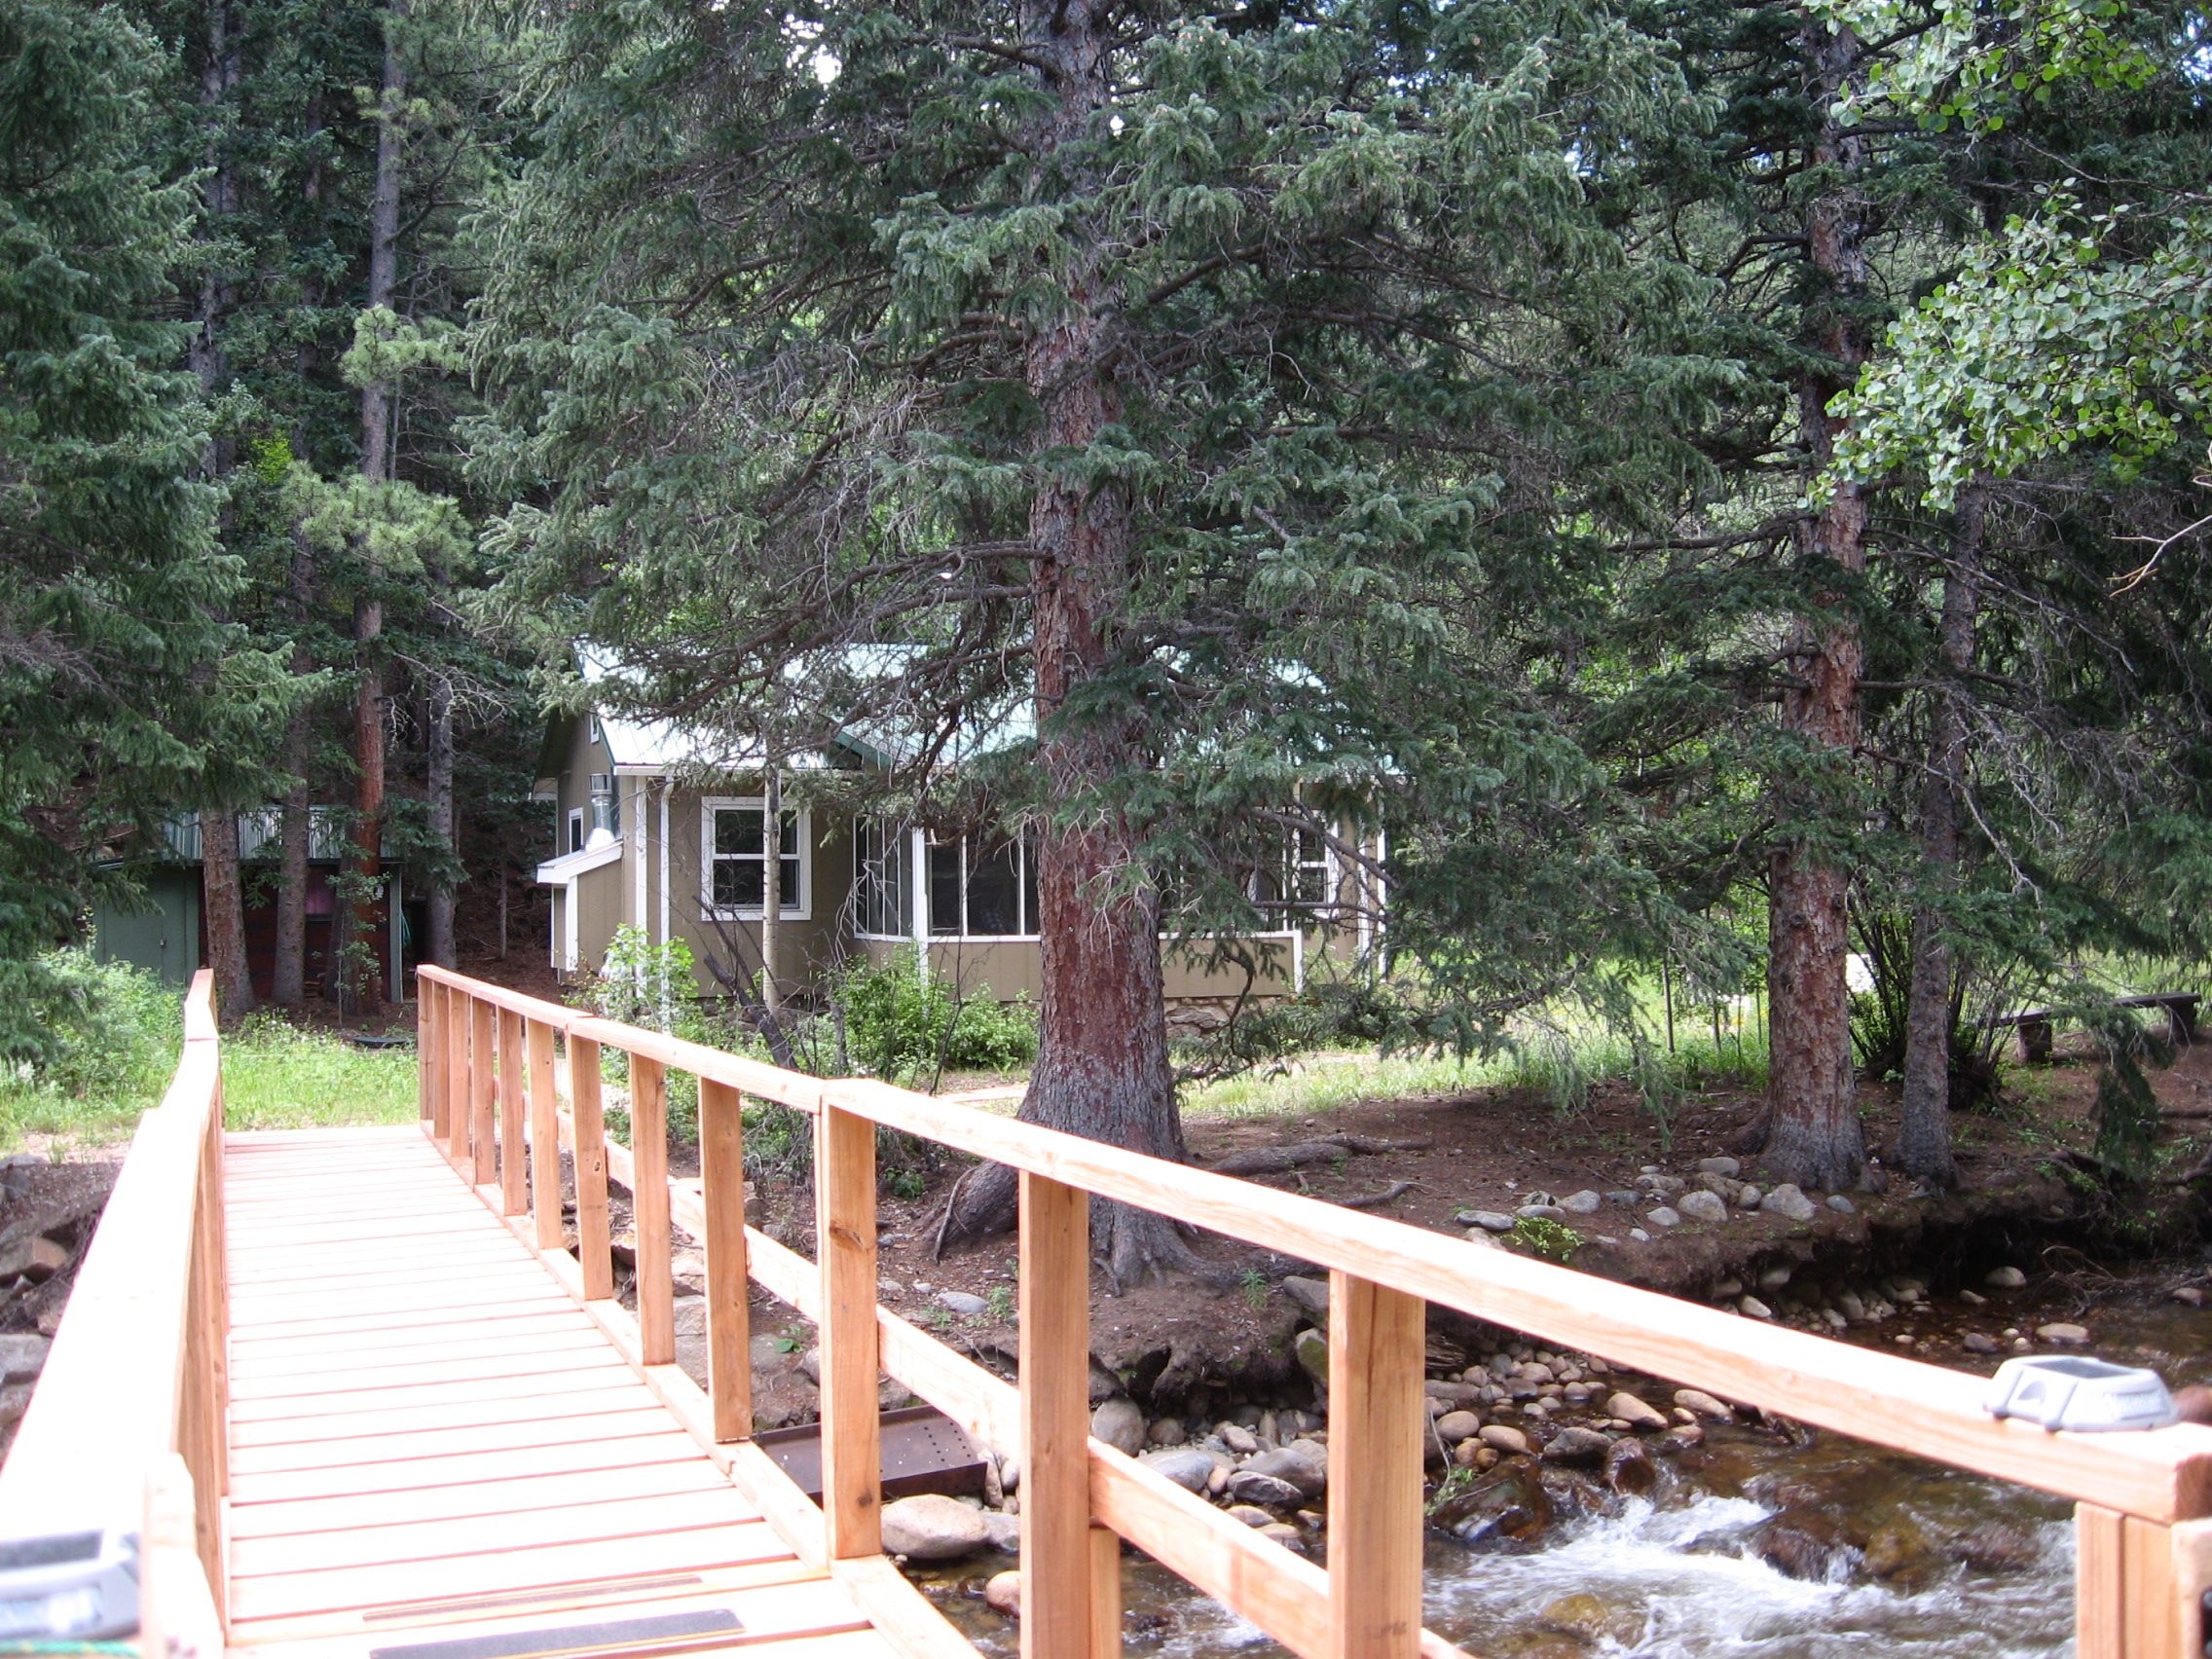 Footbridge to the cabin